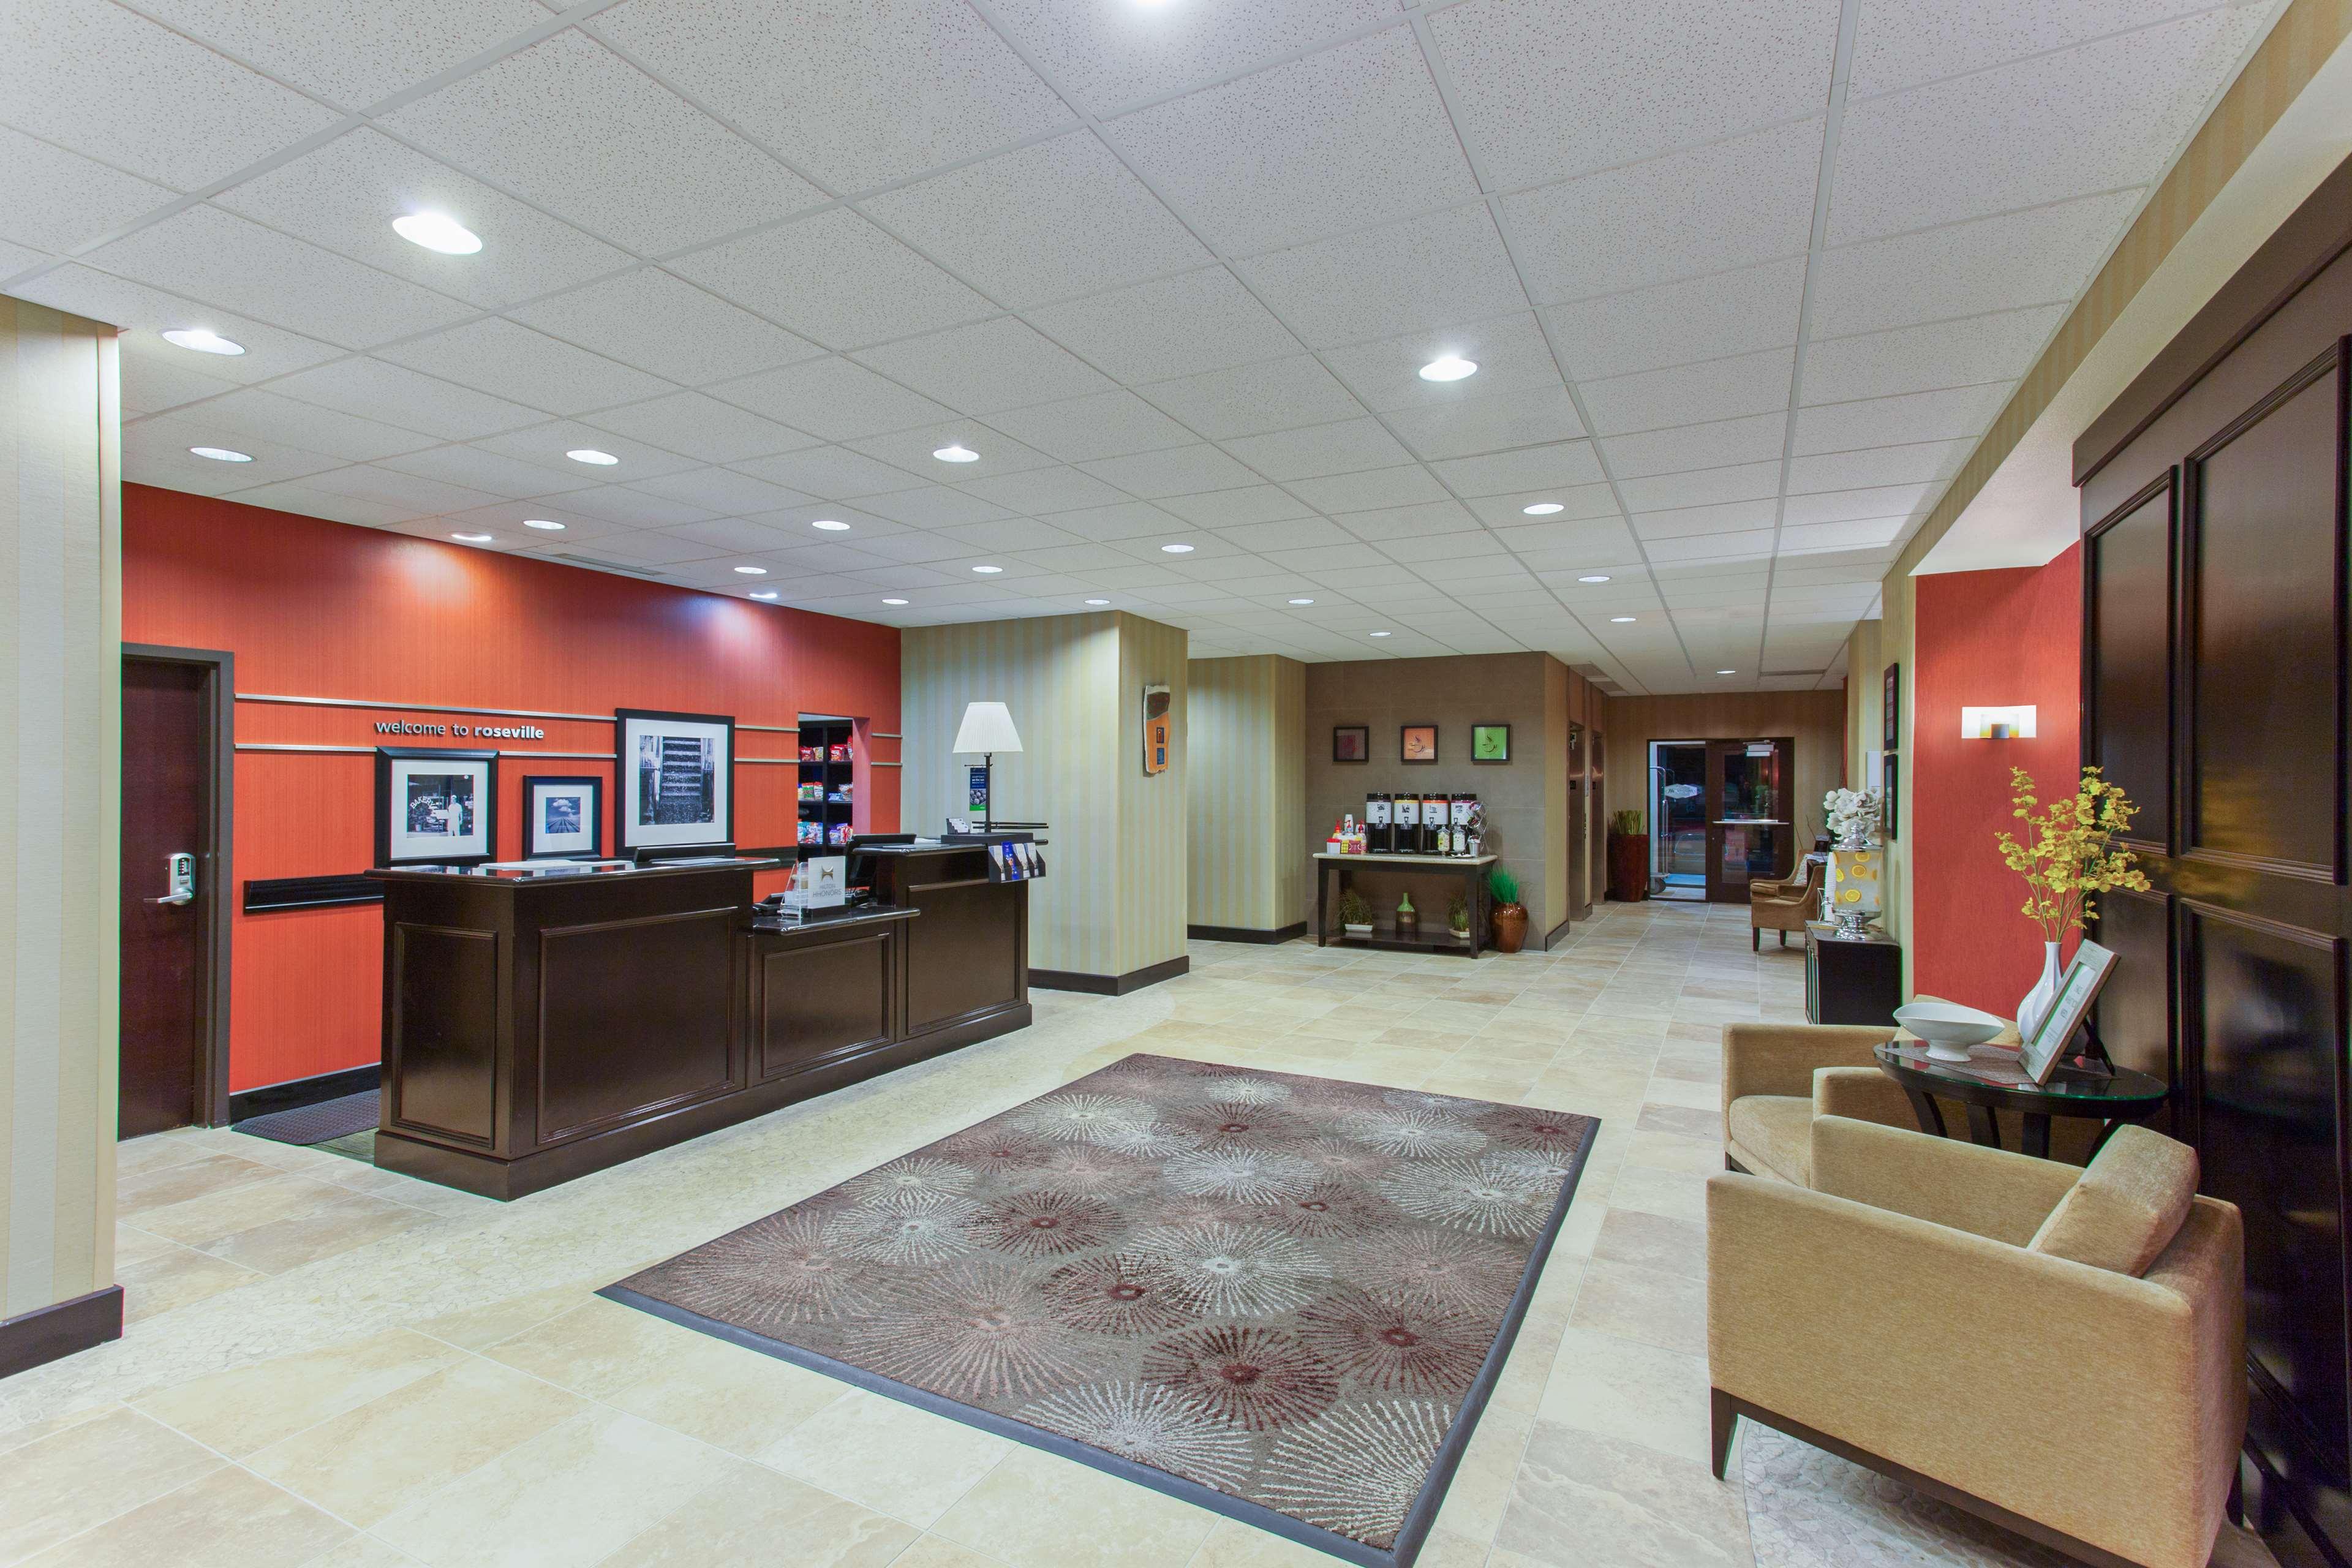 Hampton Inn & Suites Roseville image 1